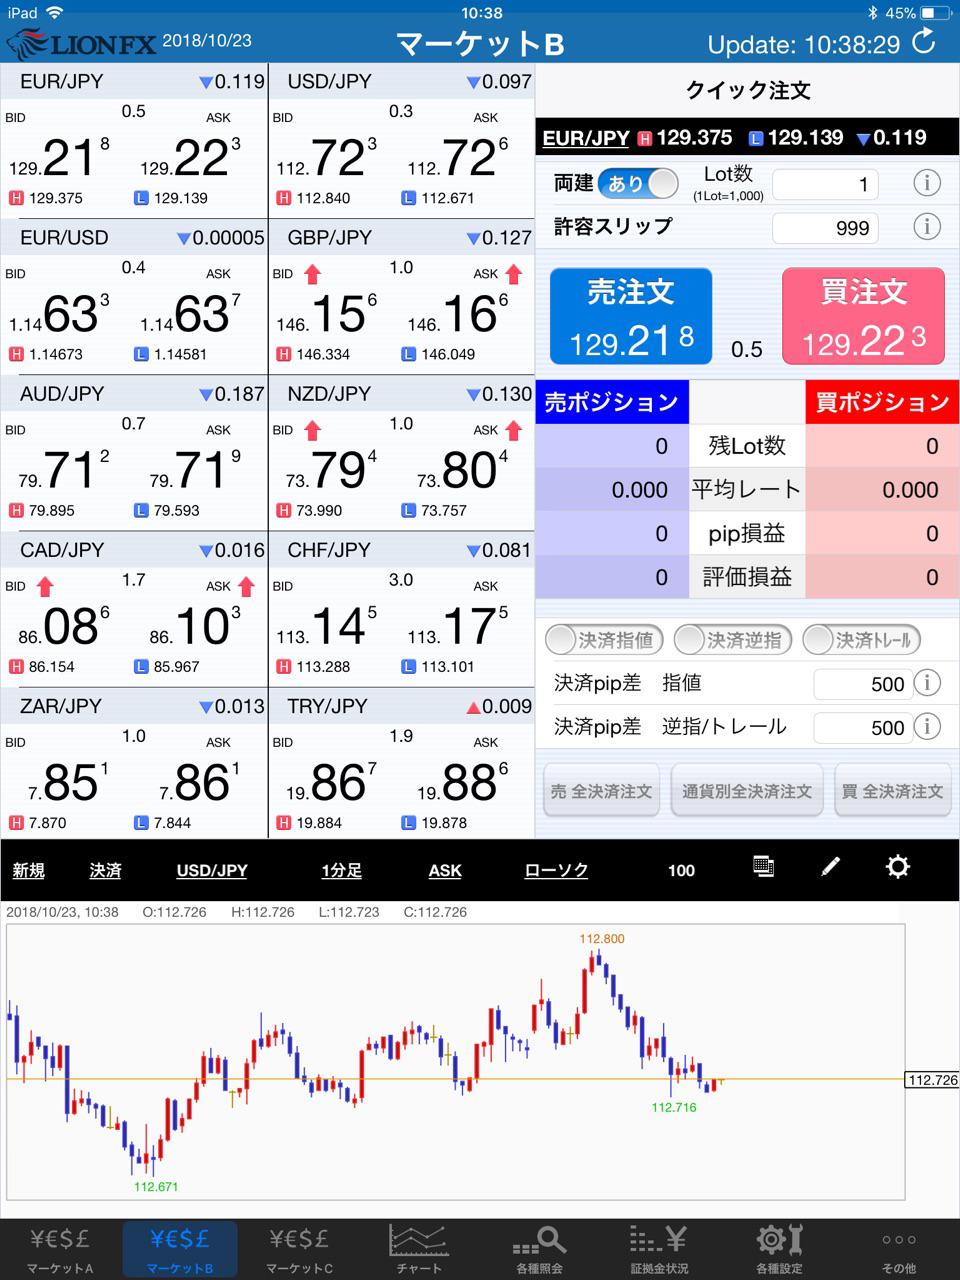 LION FX iPadアプリ